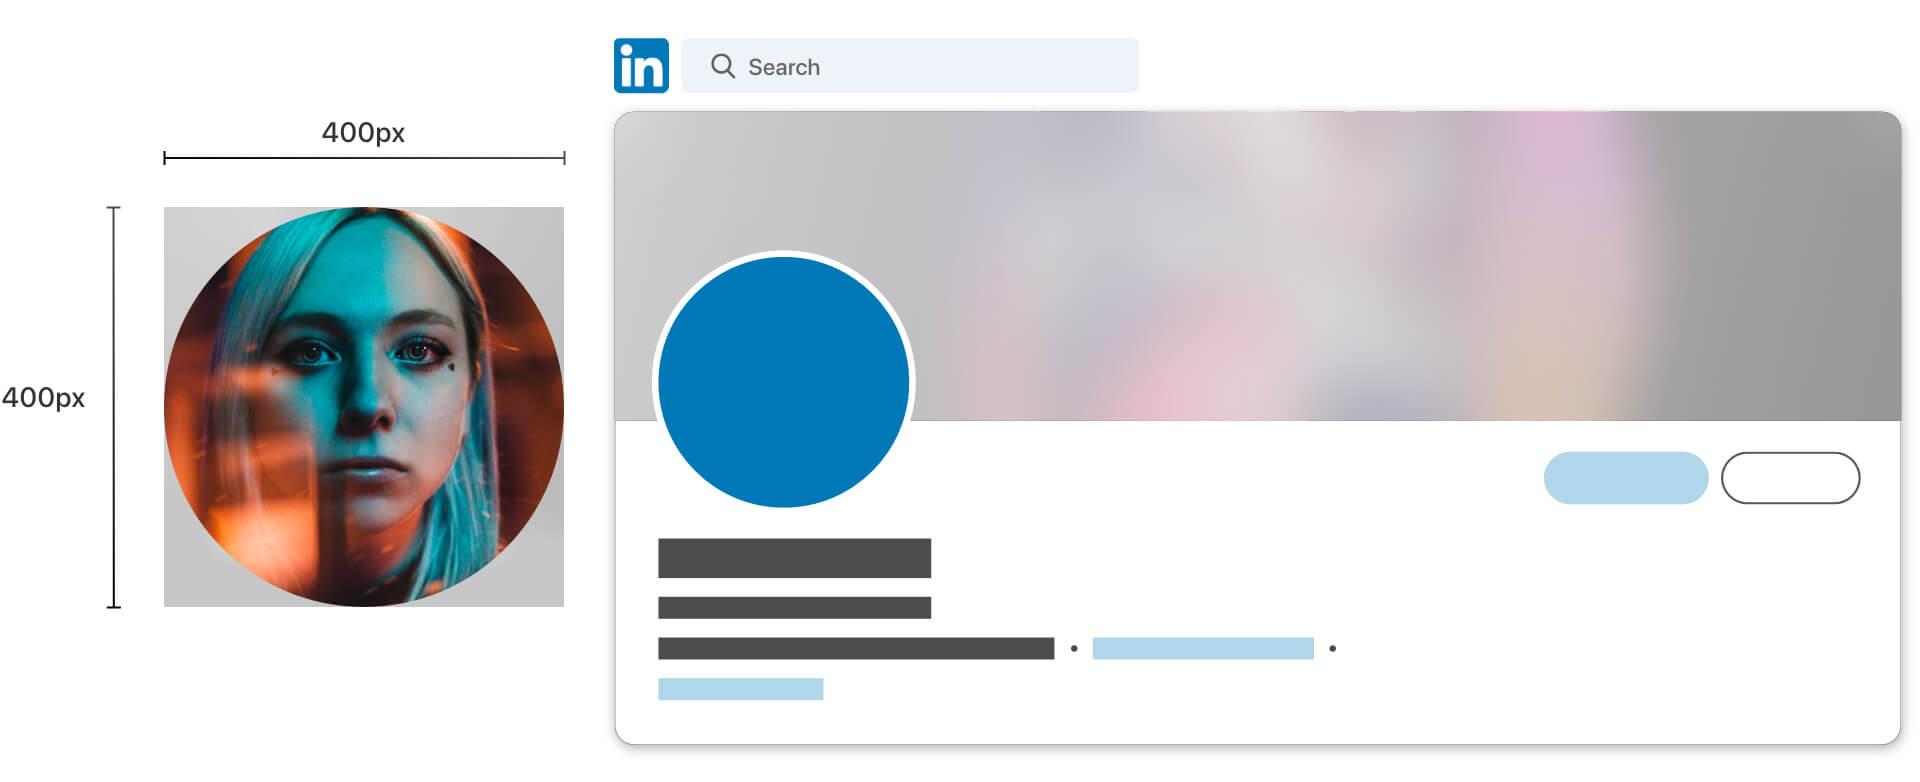 linkedin profile image dimensions